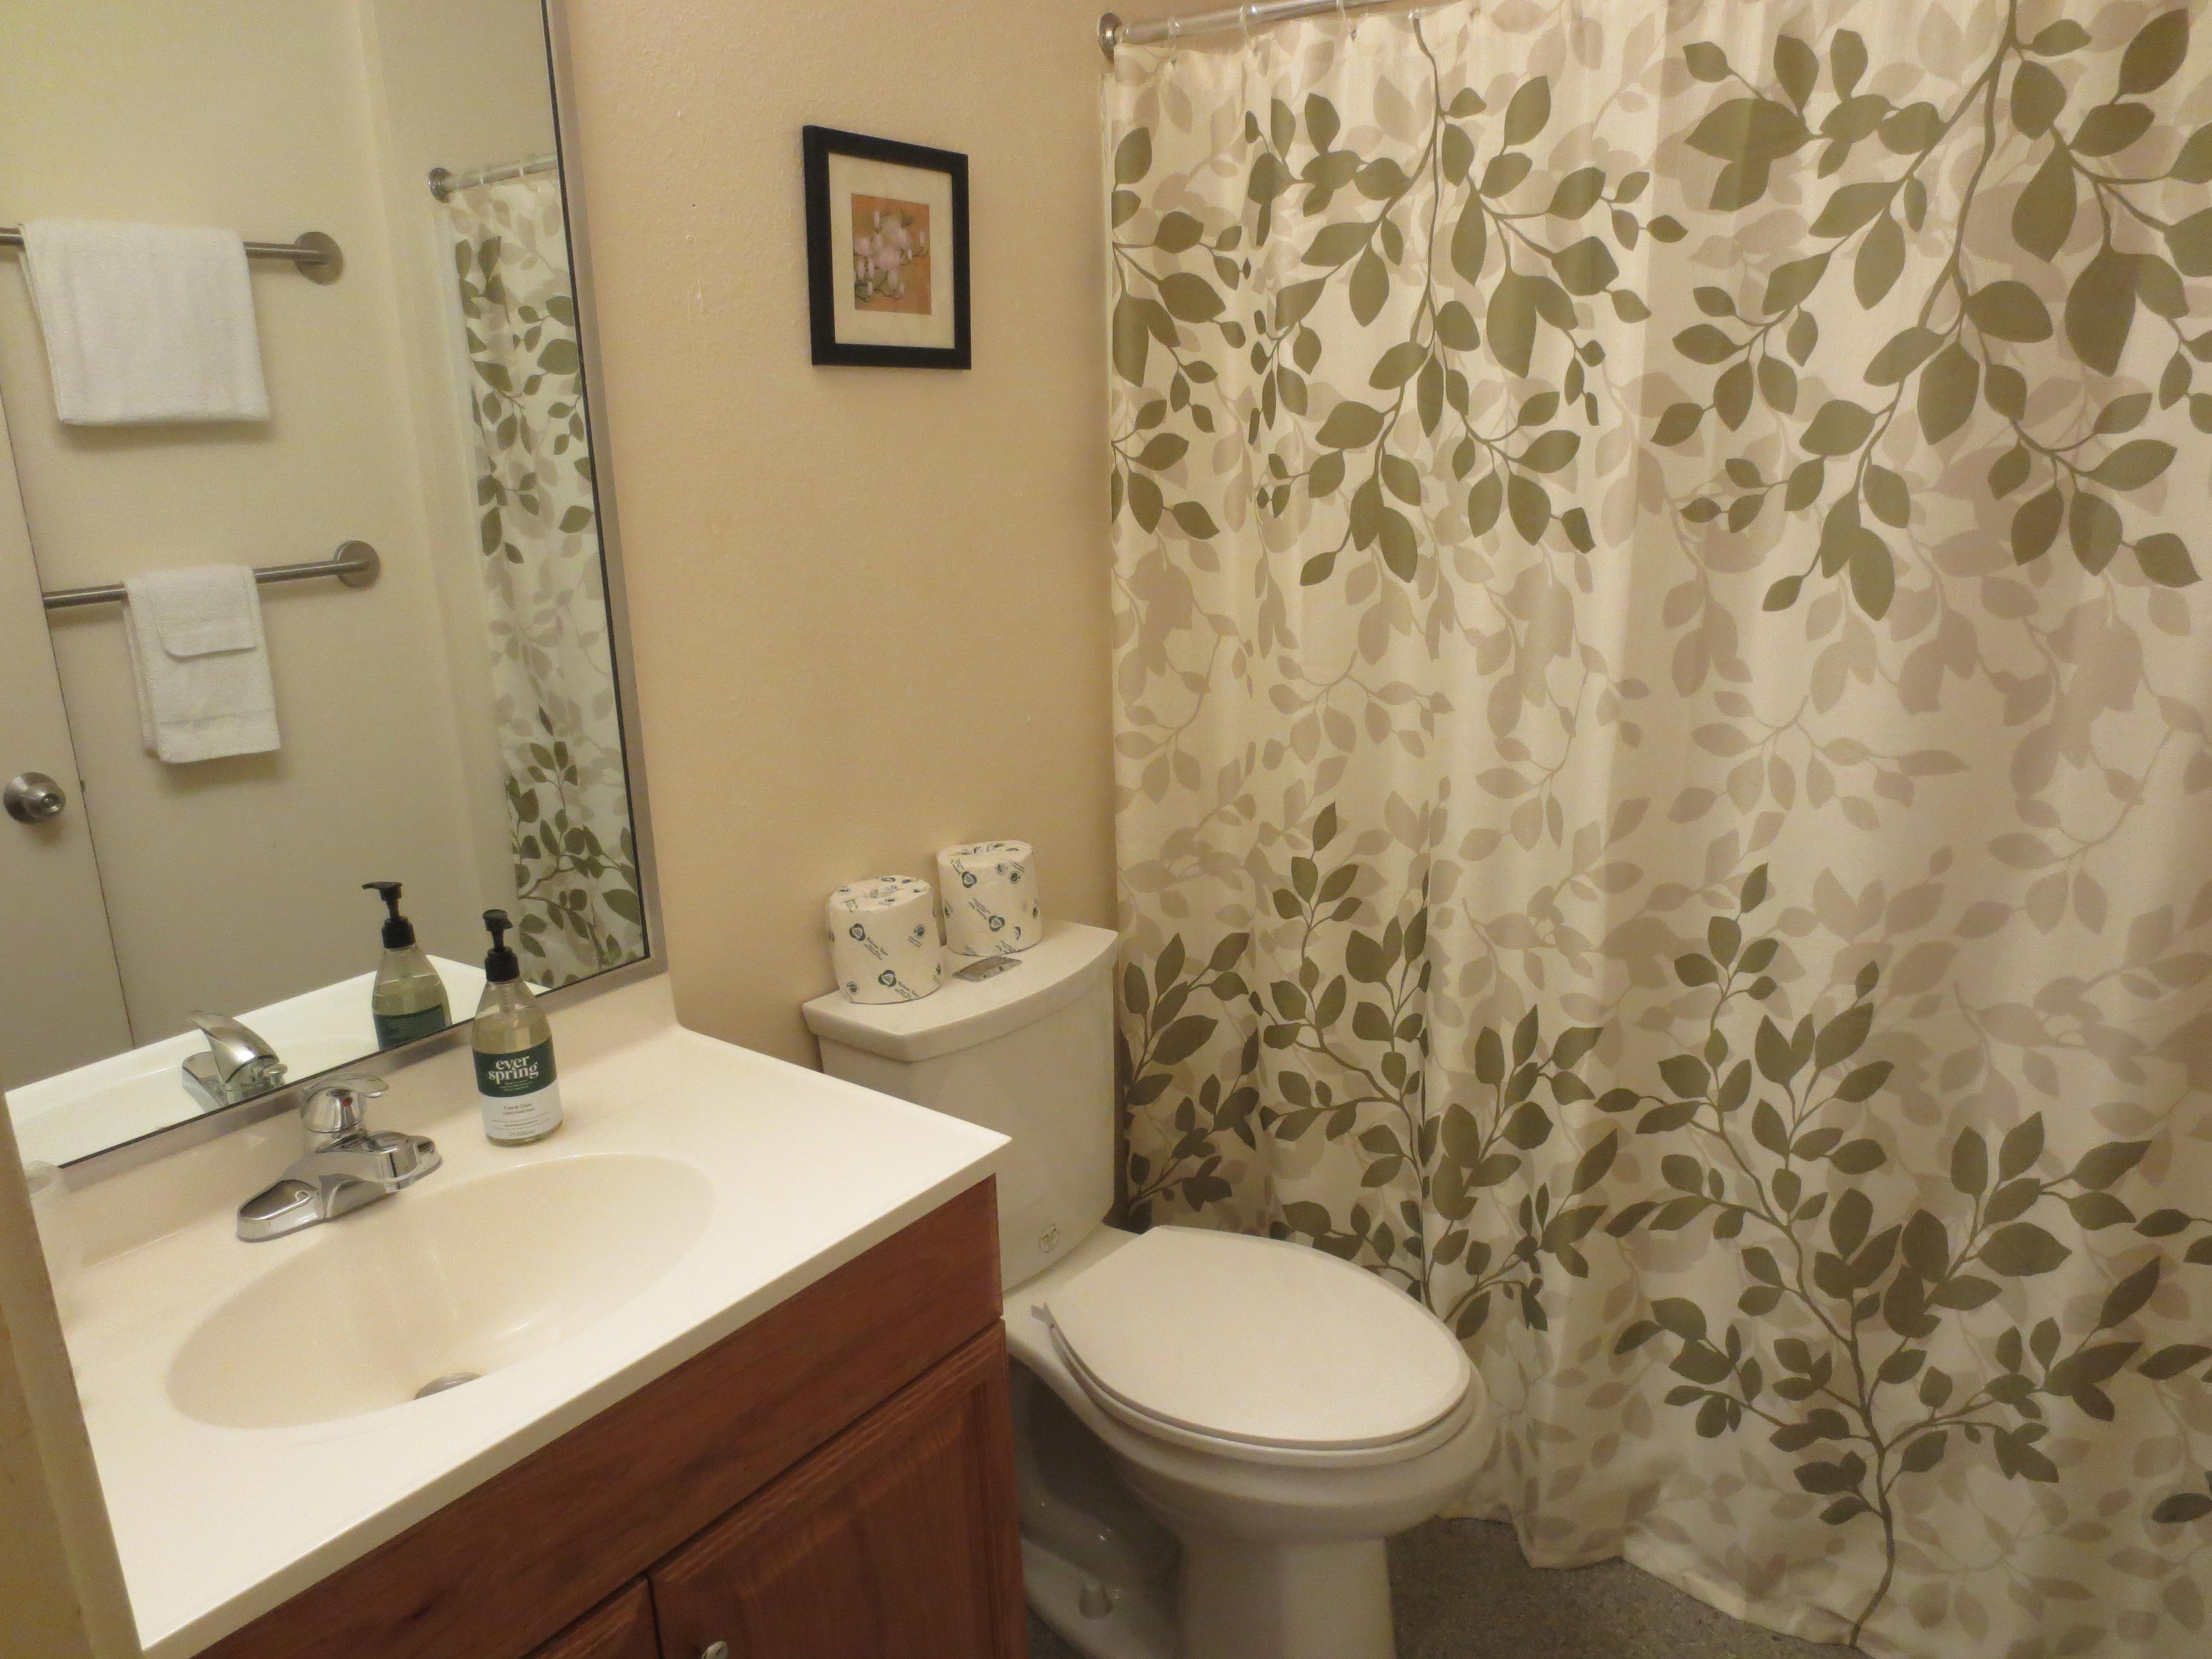 H210 Bathroom